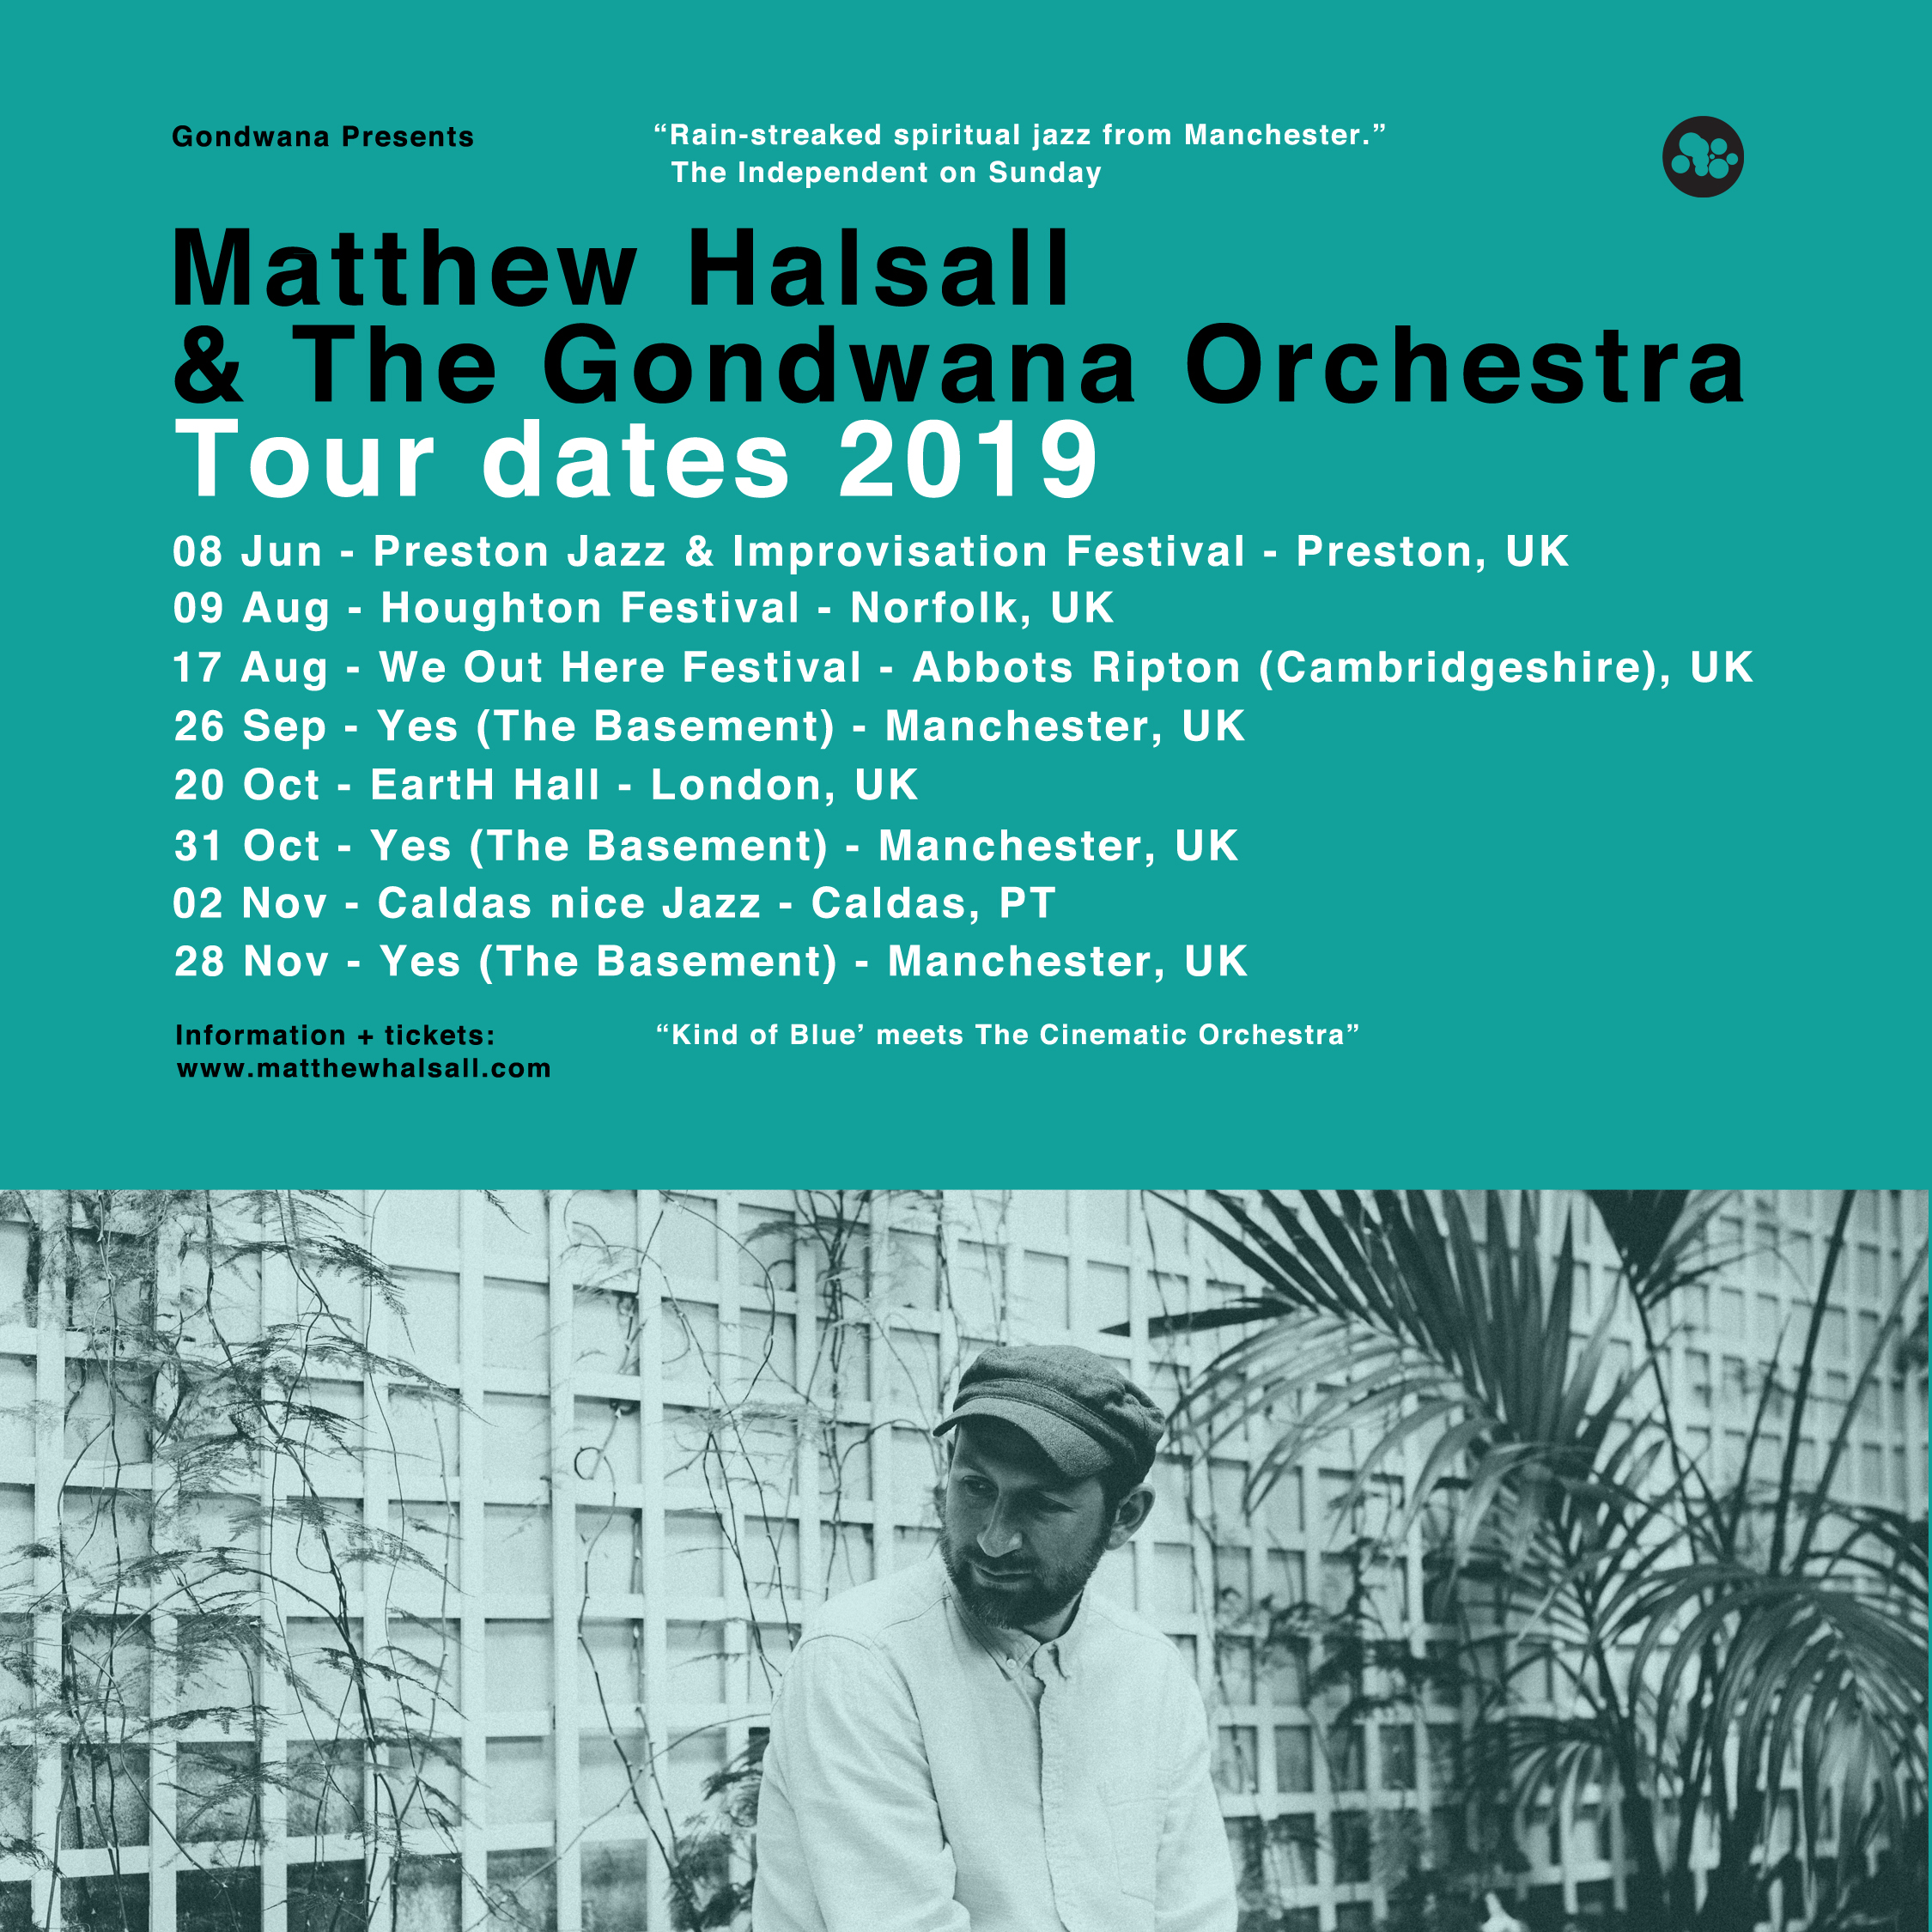 Matthew Halsall website image